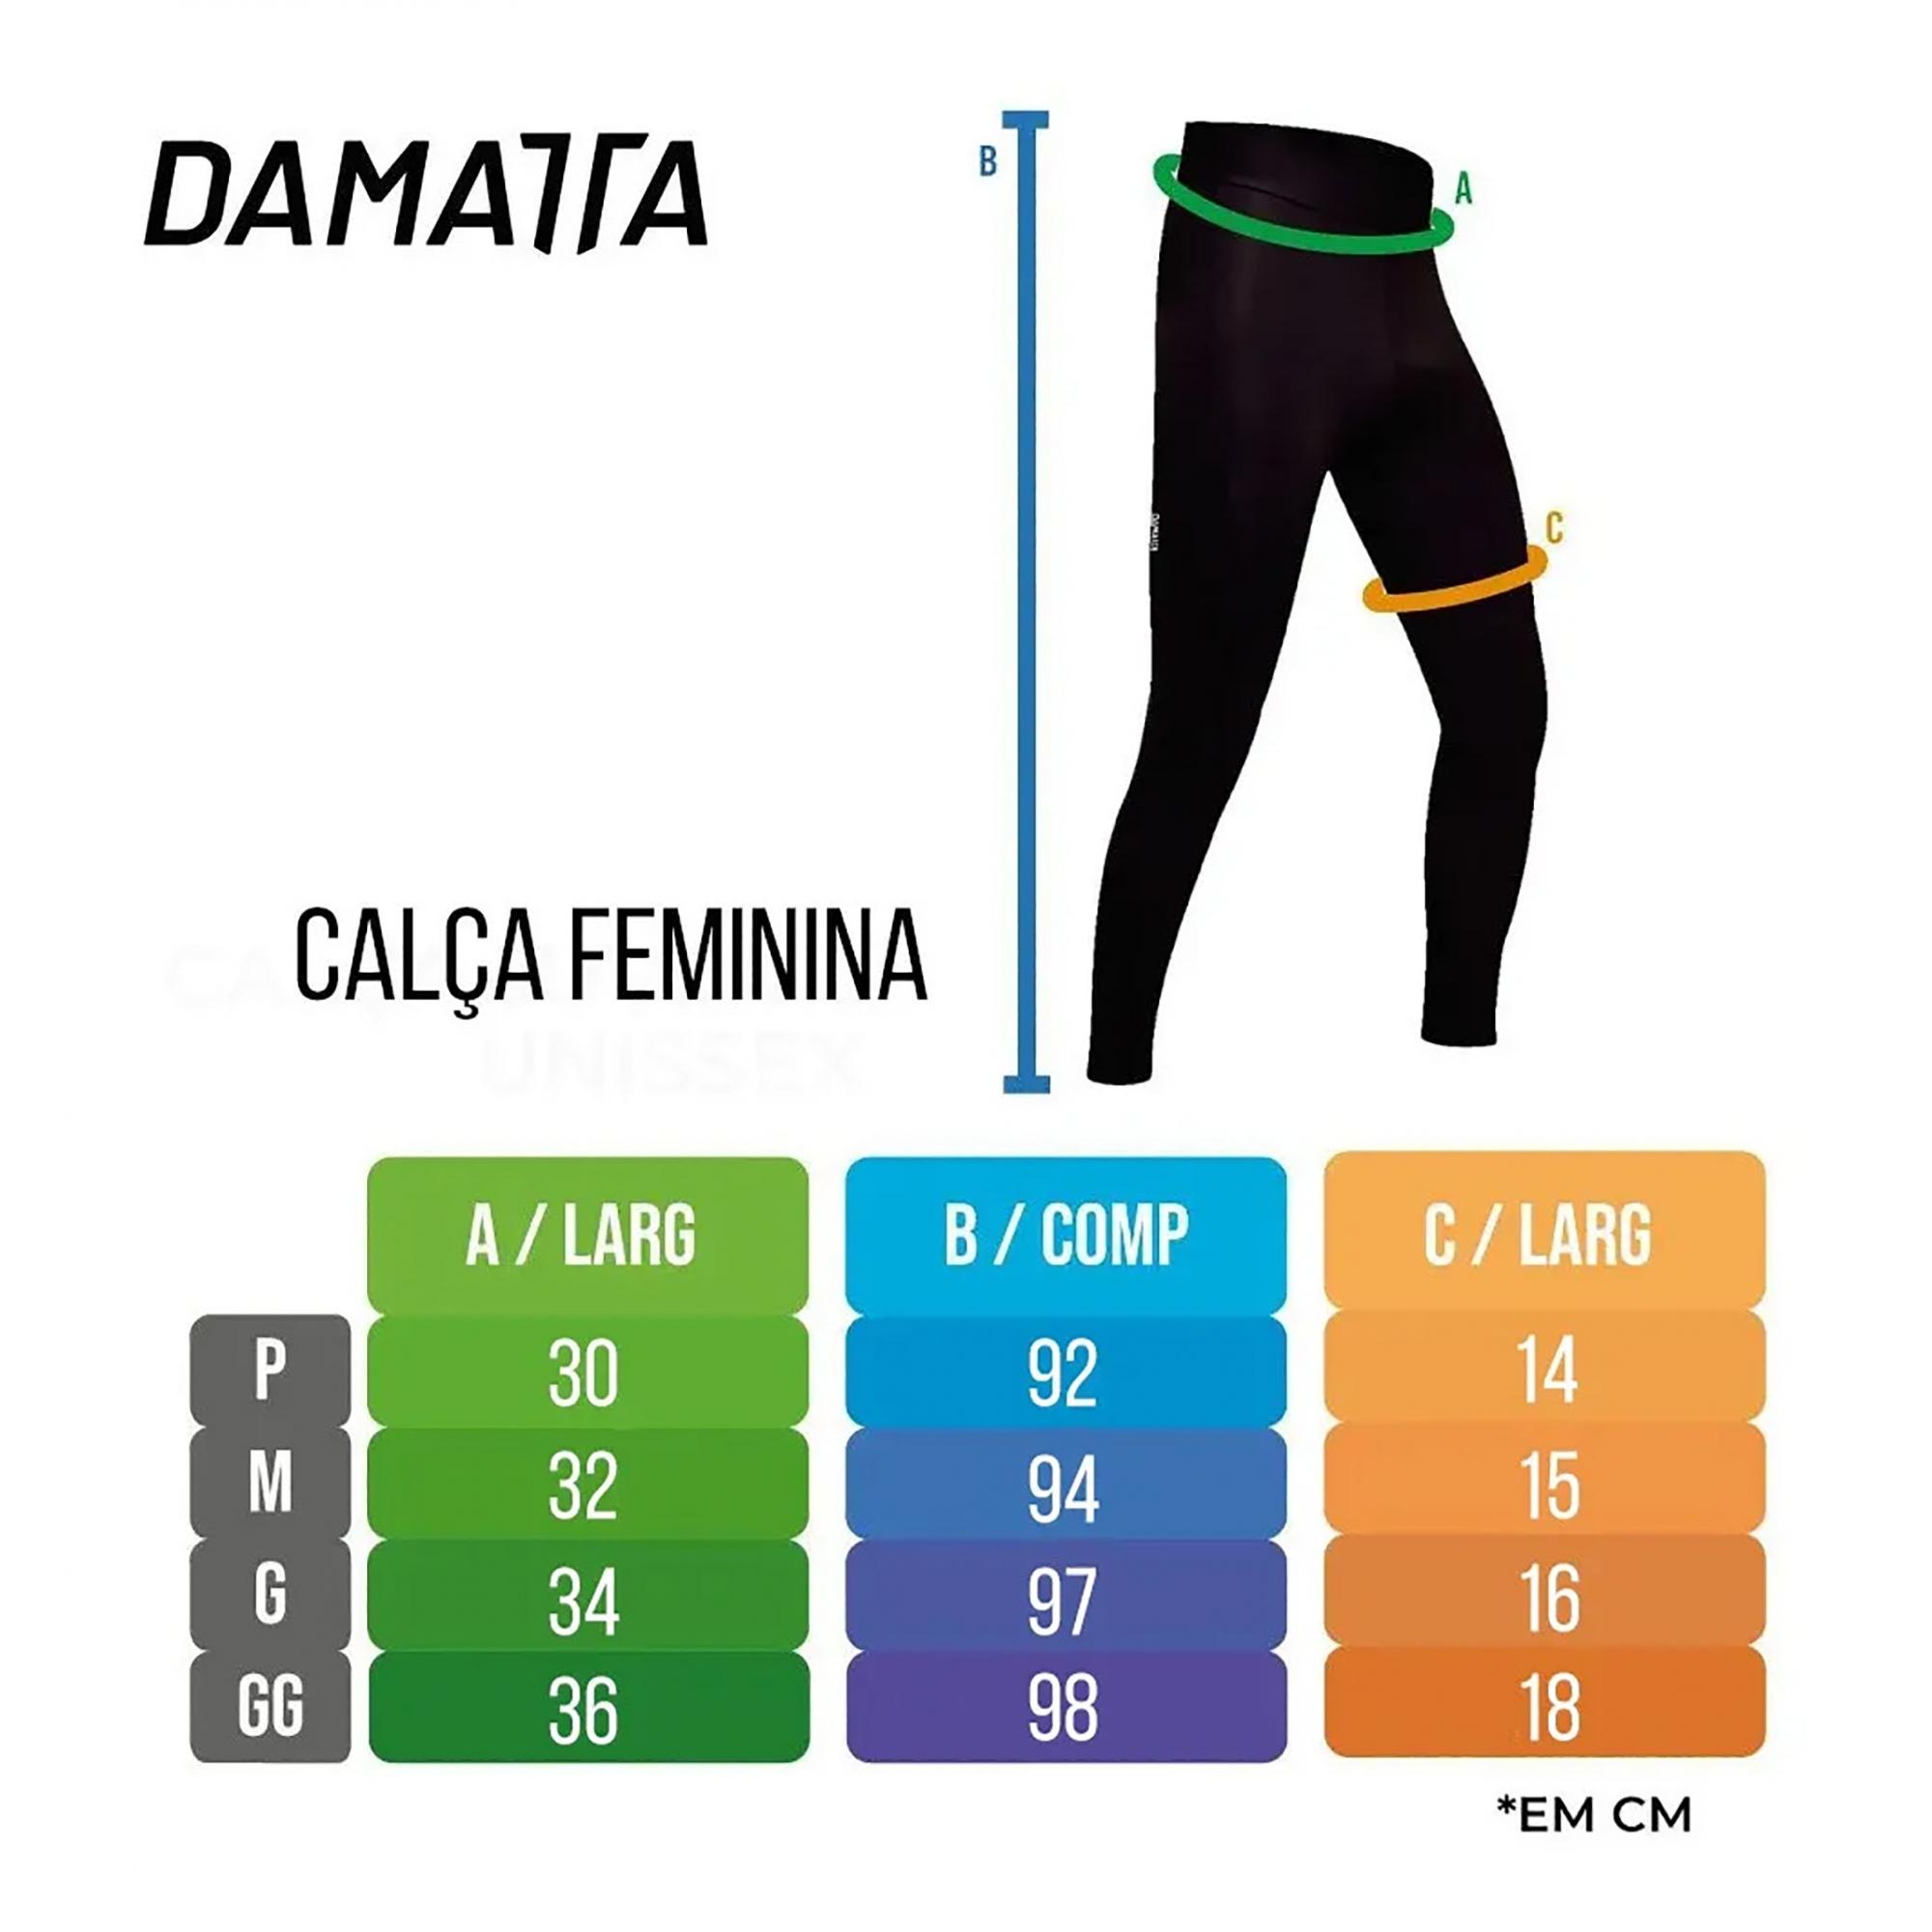 Calça Feminina Ciclismo Ride Preta Forro Gel - Damatta